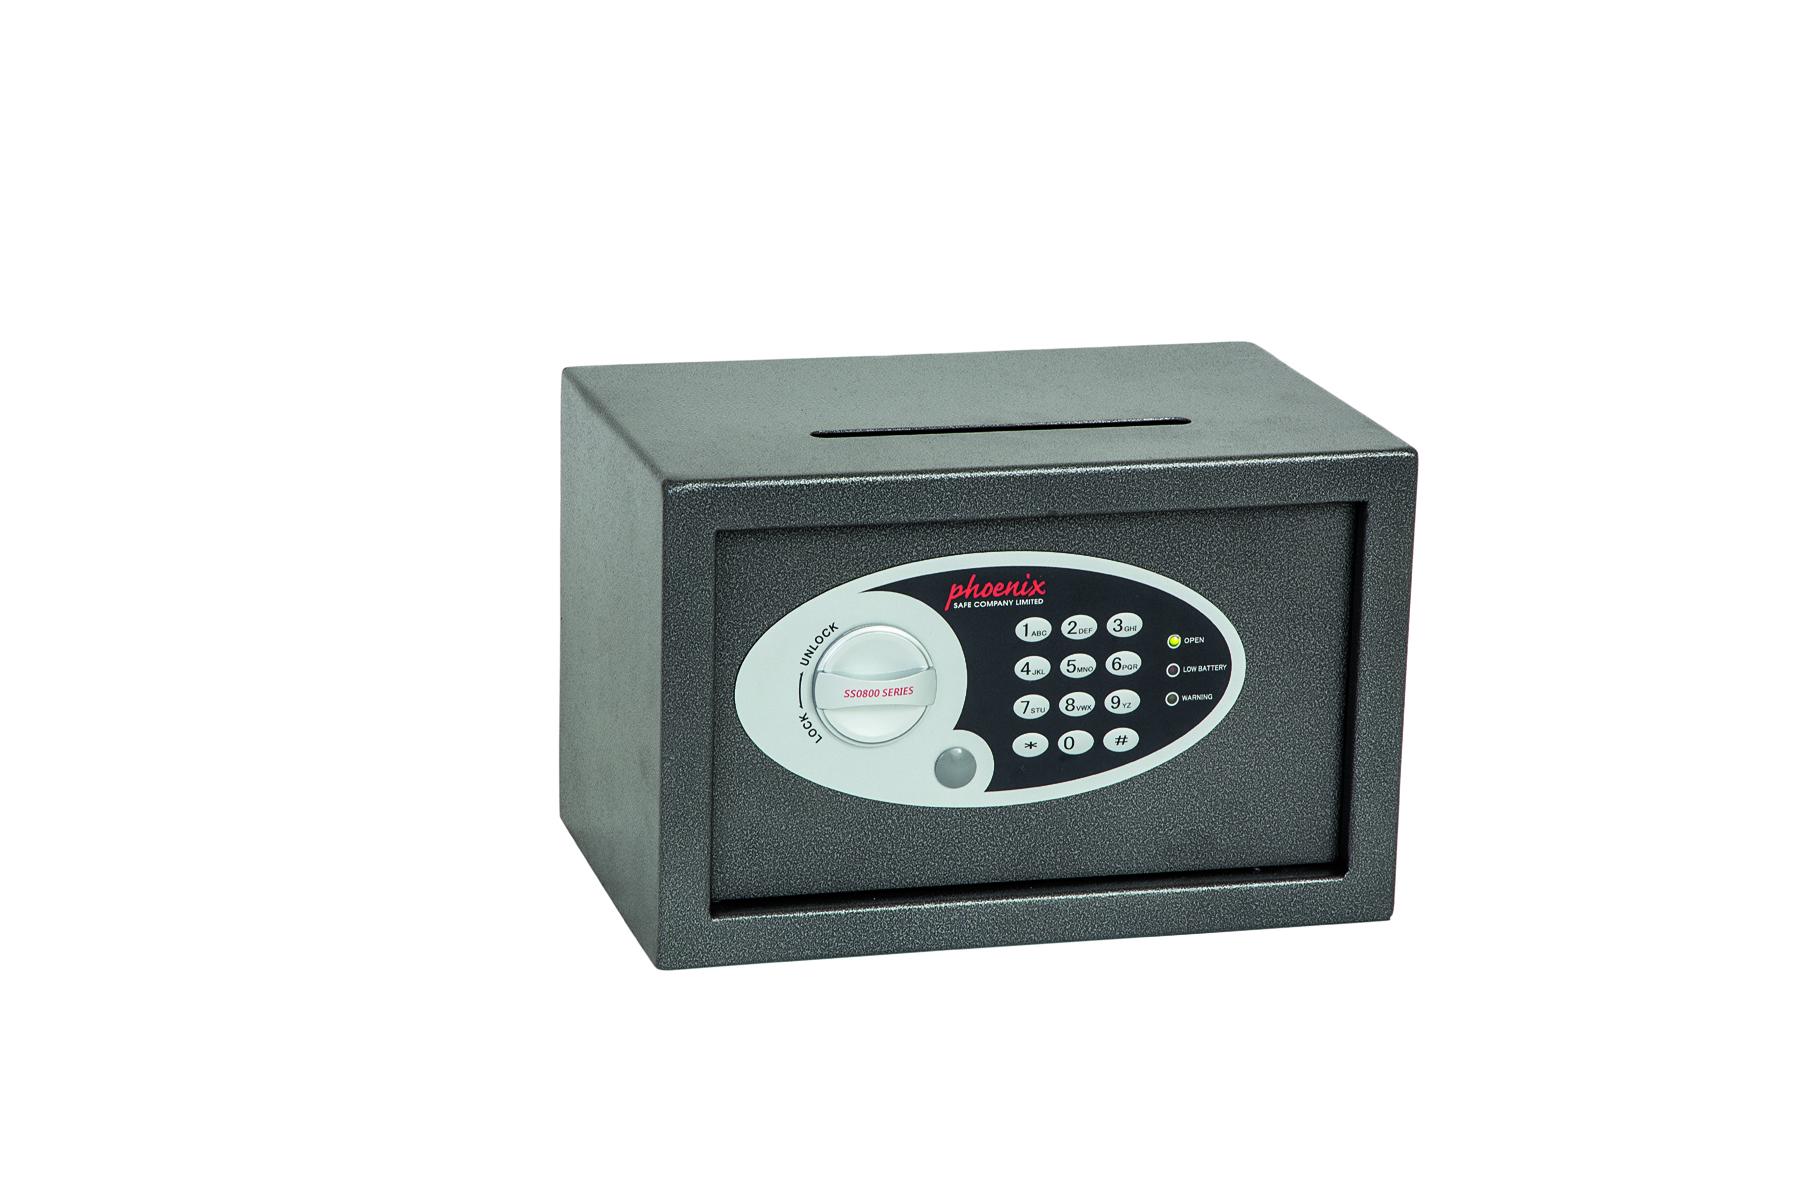 Key Store Phoenix Vela dposit Home & Office sz 1 Safe Elctrnic Lock